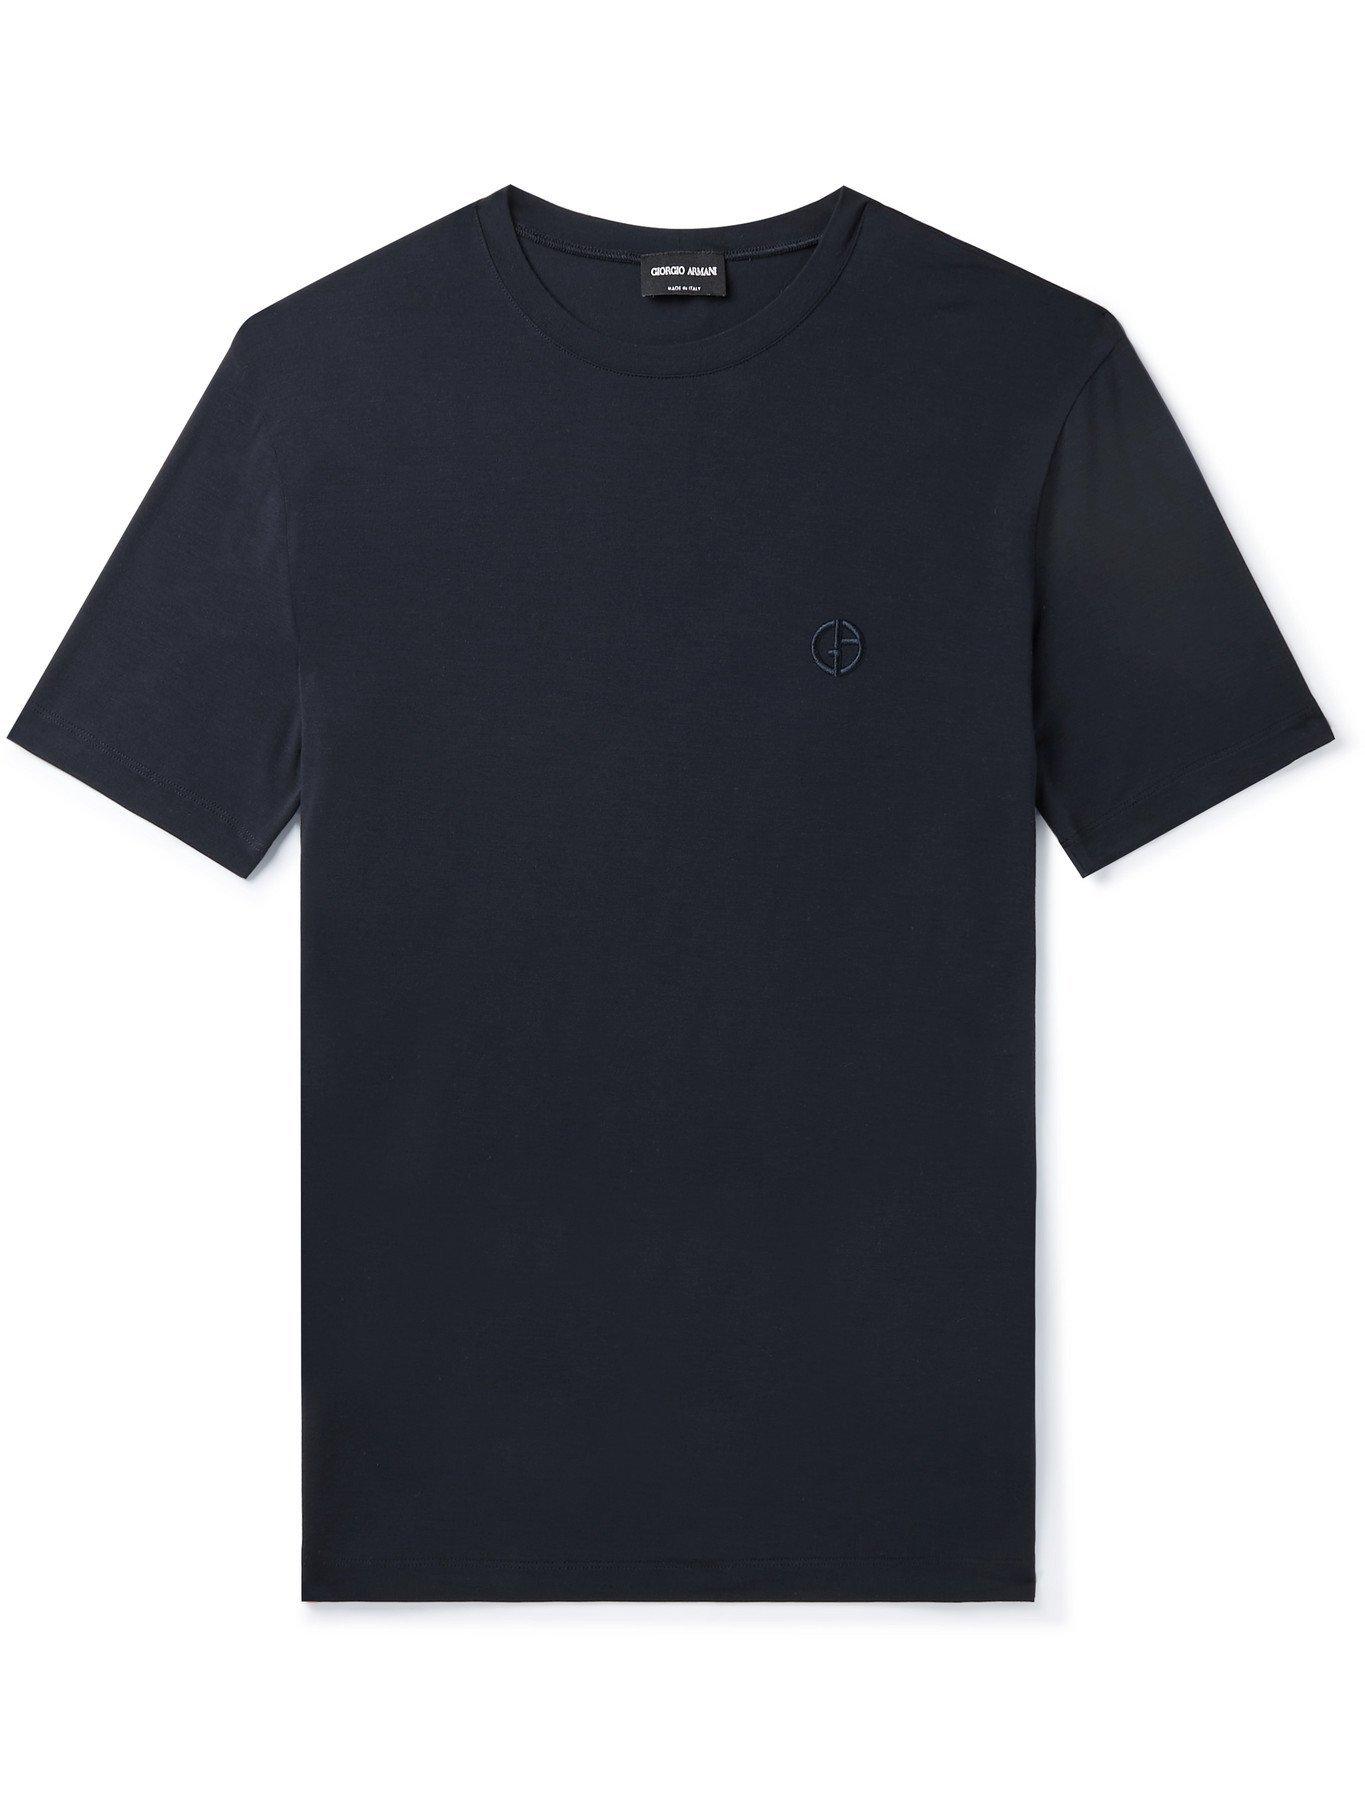 GIORGIO ARMANI - Slim-Fit Stretch-Jersey T-Shirt - Blue - IT 46